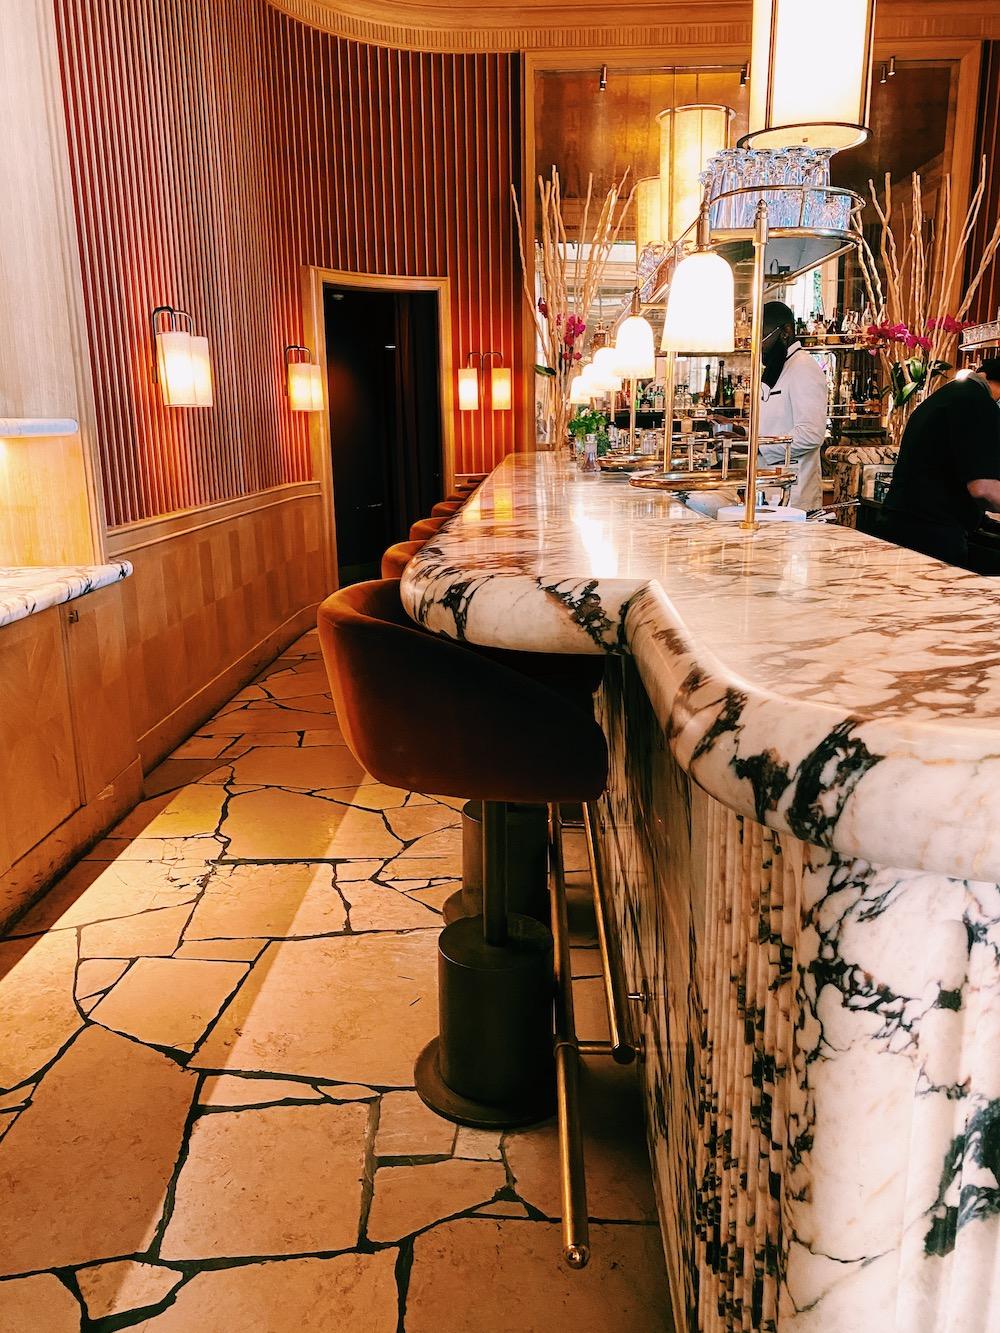 Woonatelier_Girafe-Paris-Bar